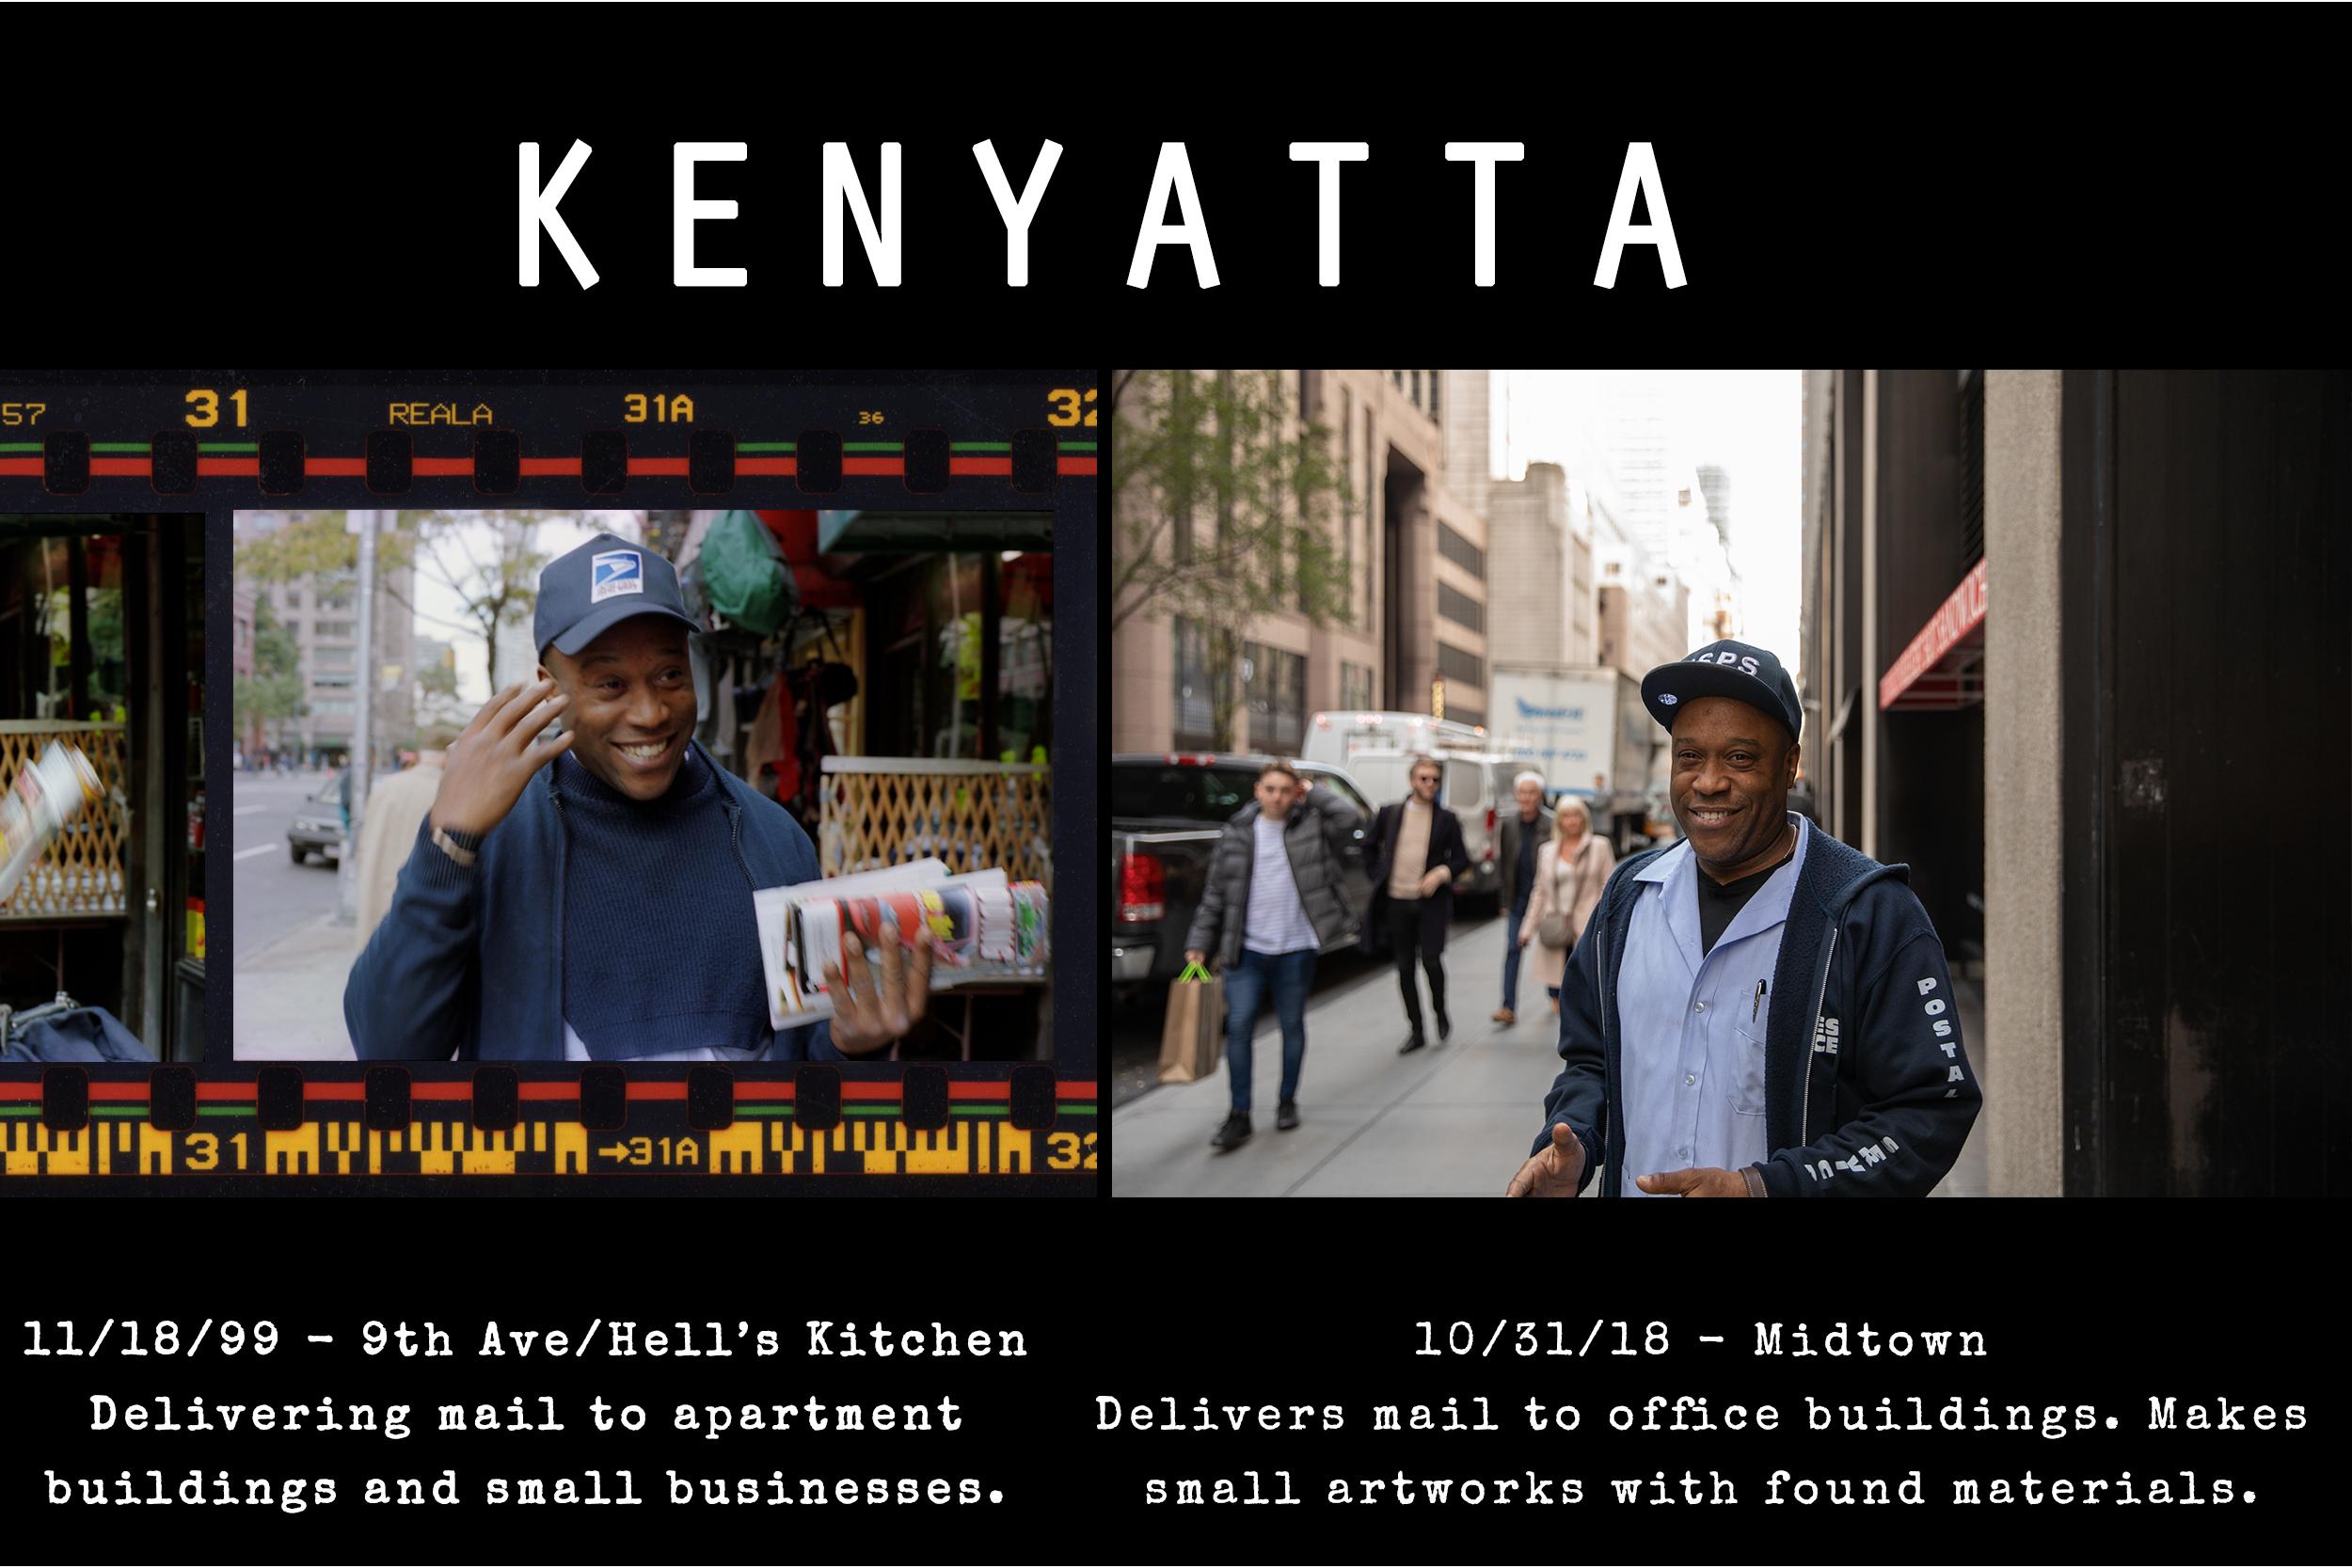 Kenyatta.jpg